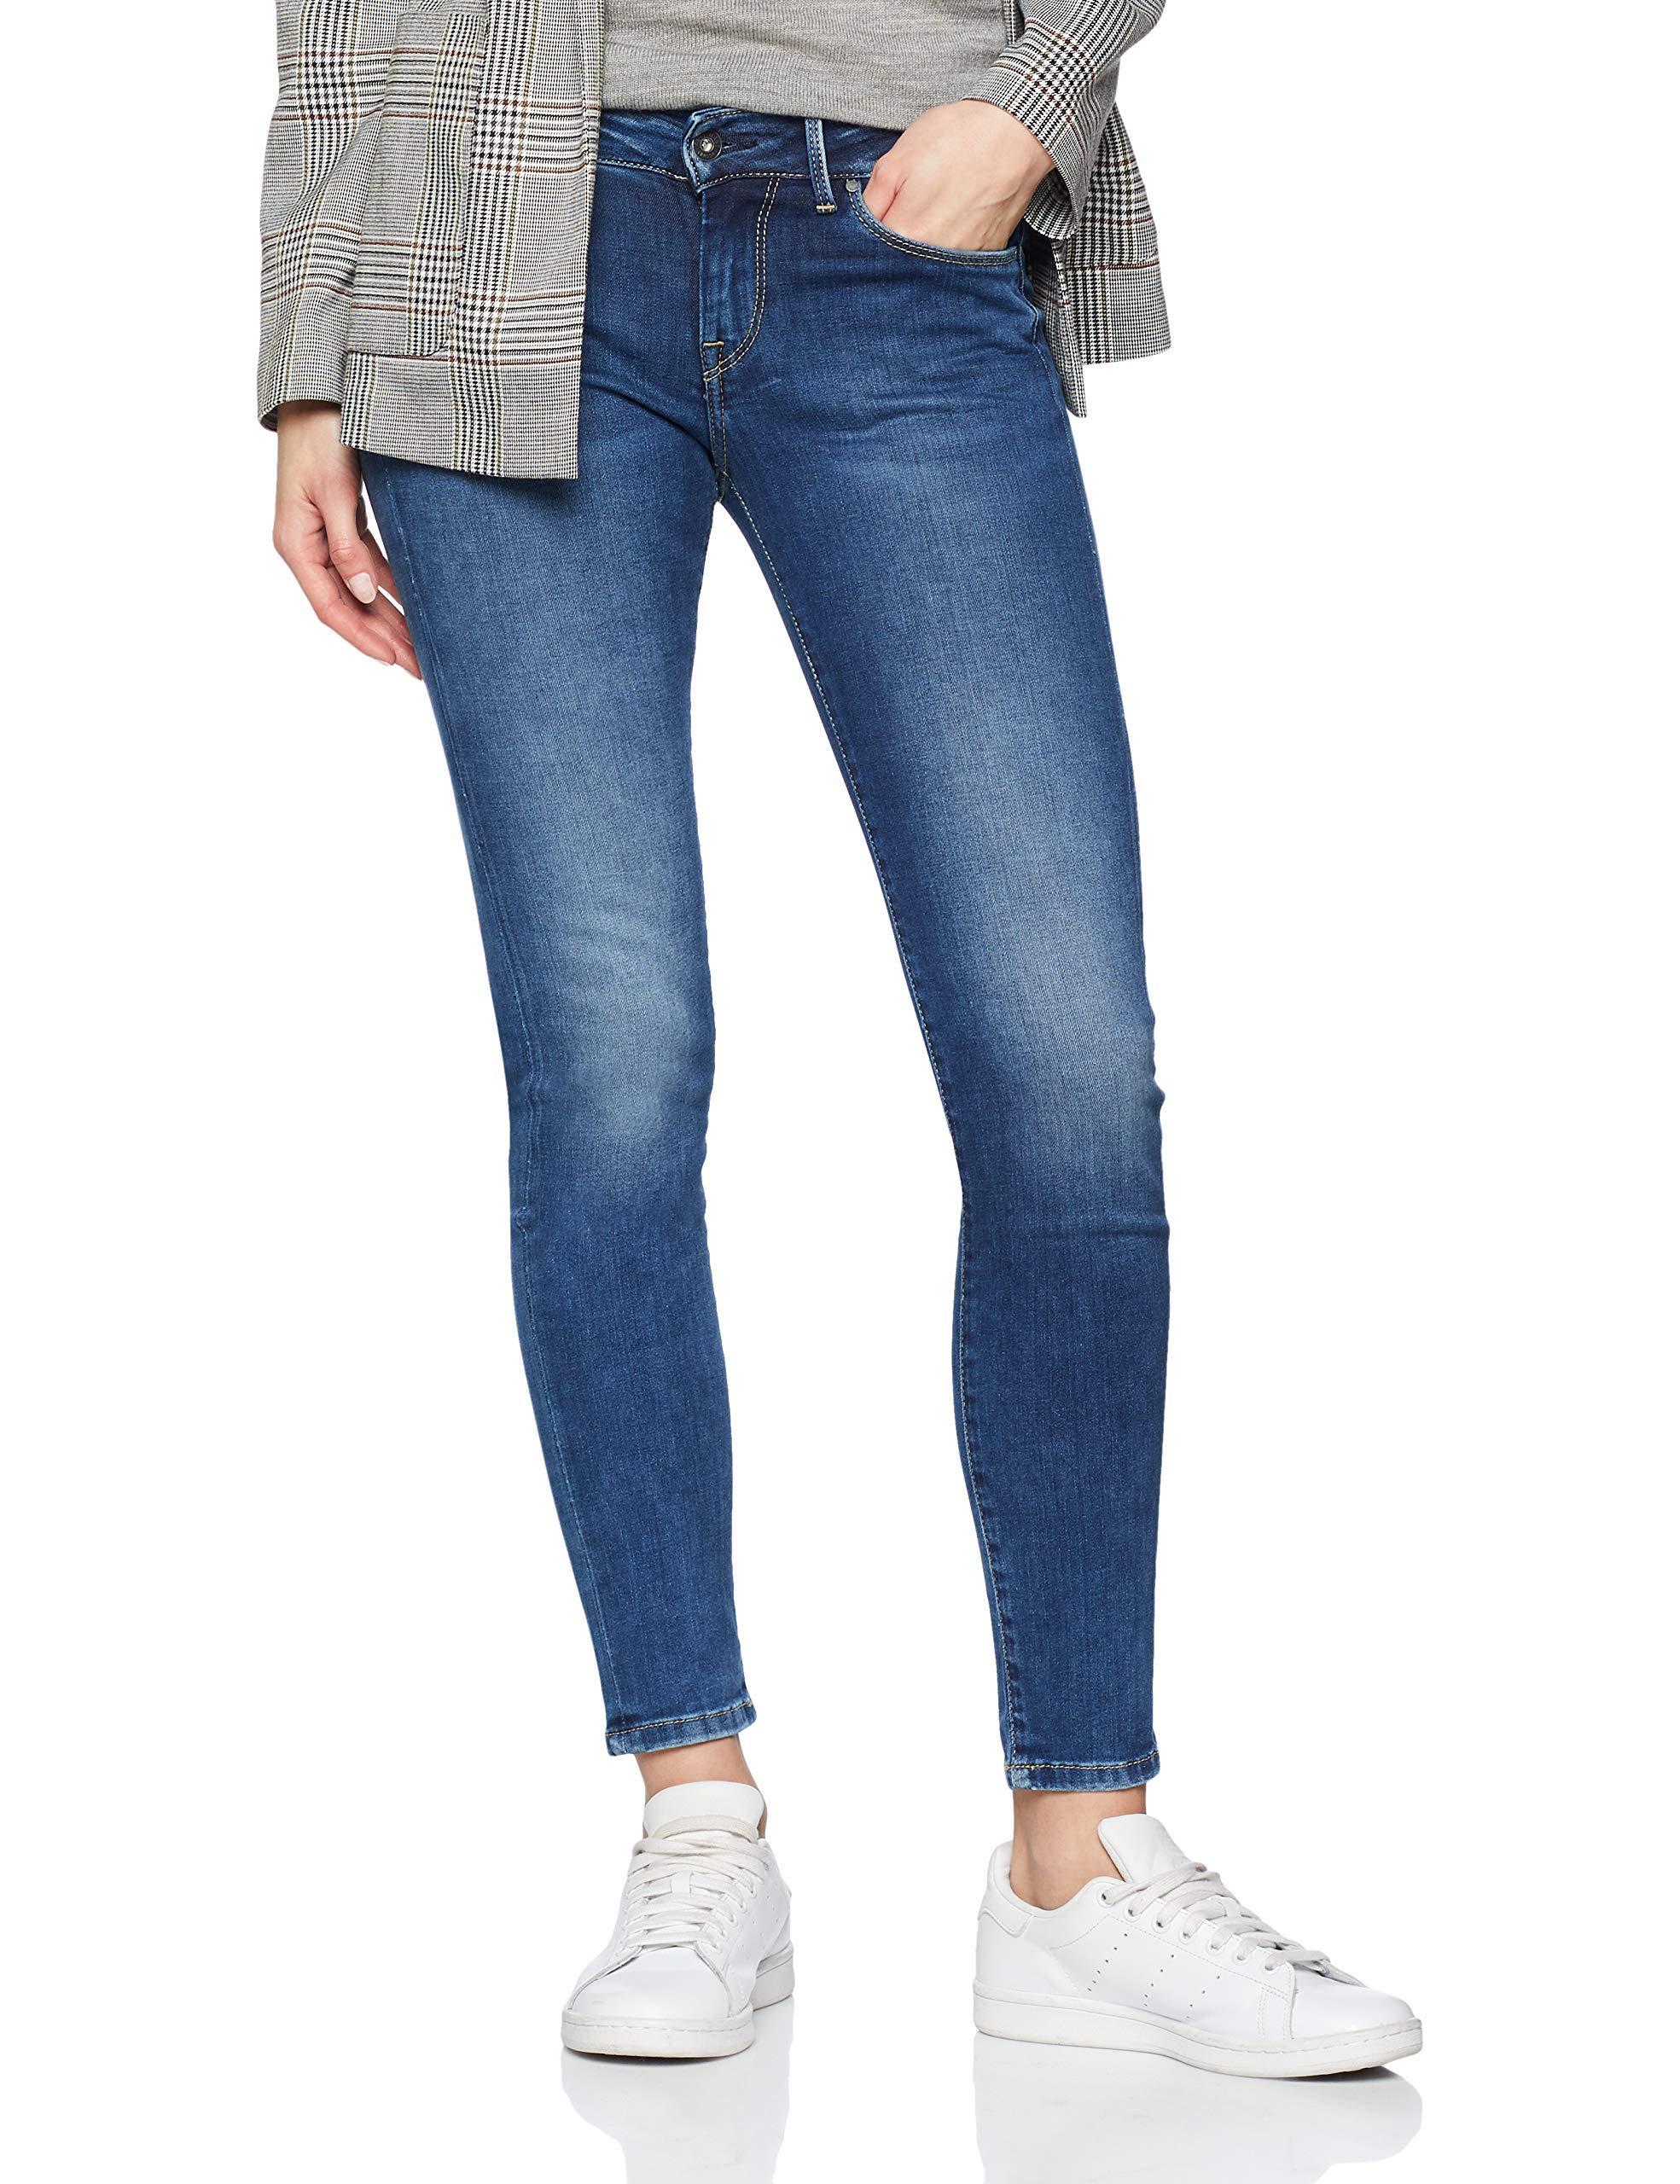 Pepe Jeans Soho Vaqueros para Mujer product image